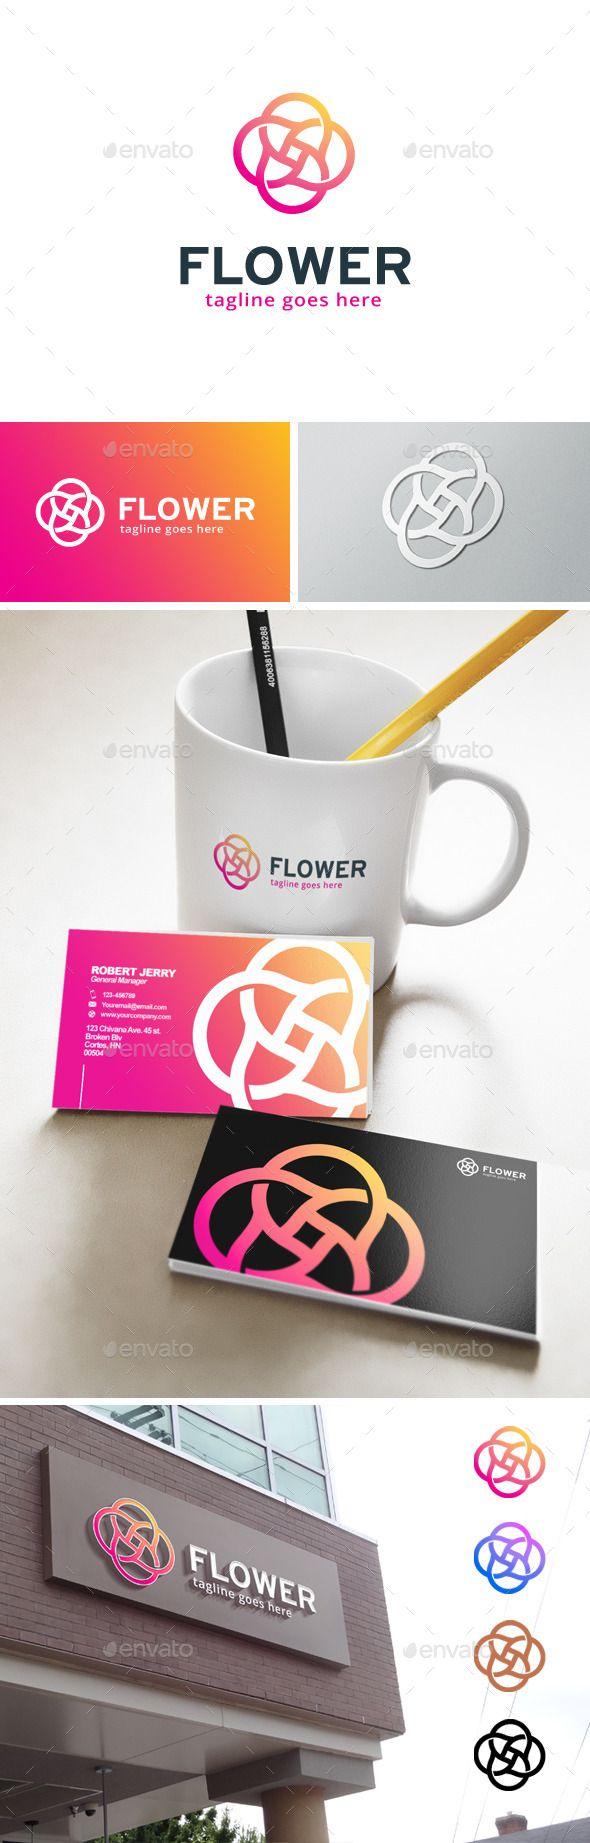 best 20 circle logos ideas on pinterest circle logo design flower circle logo design template vector logotype download it here http